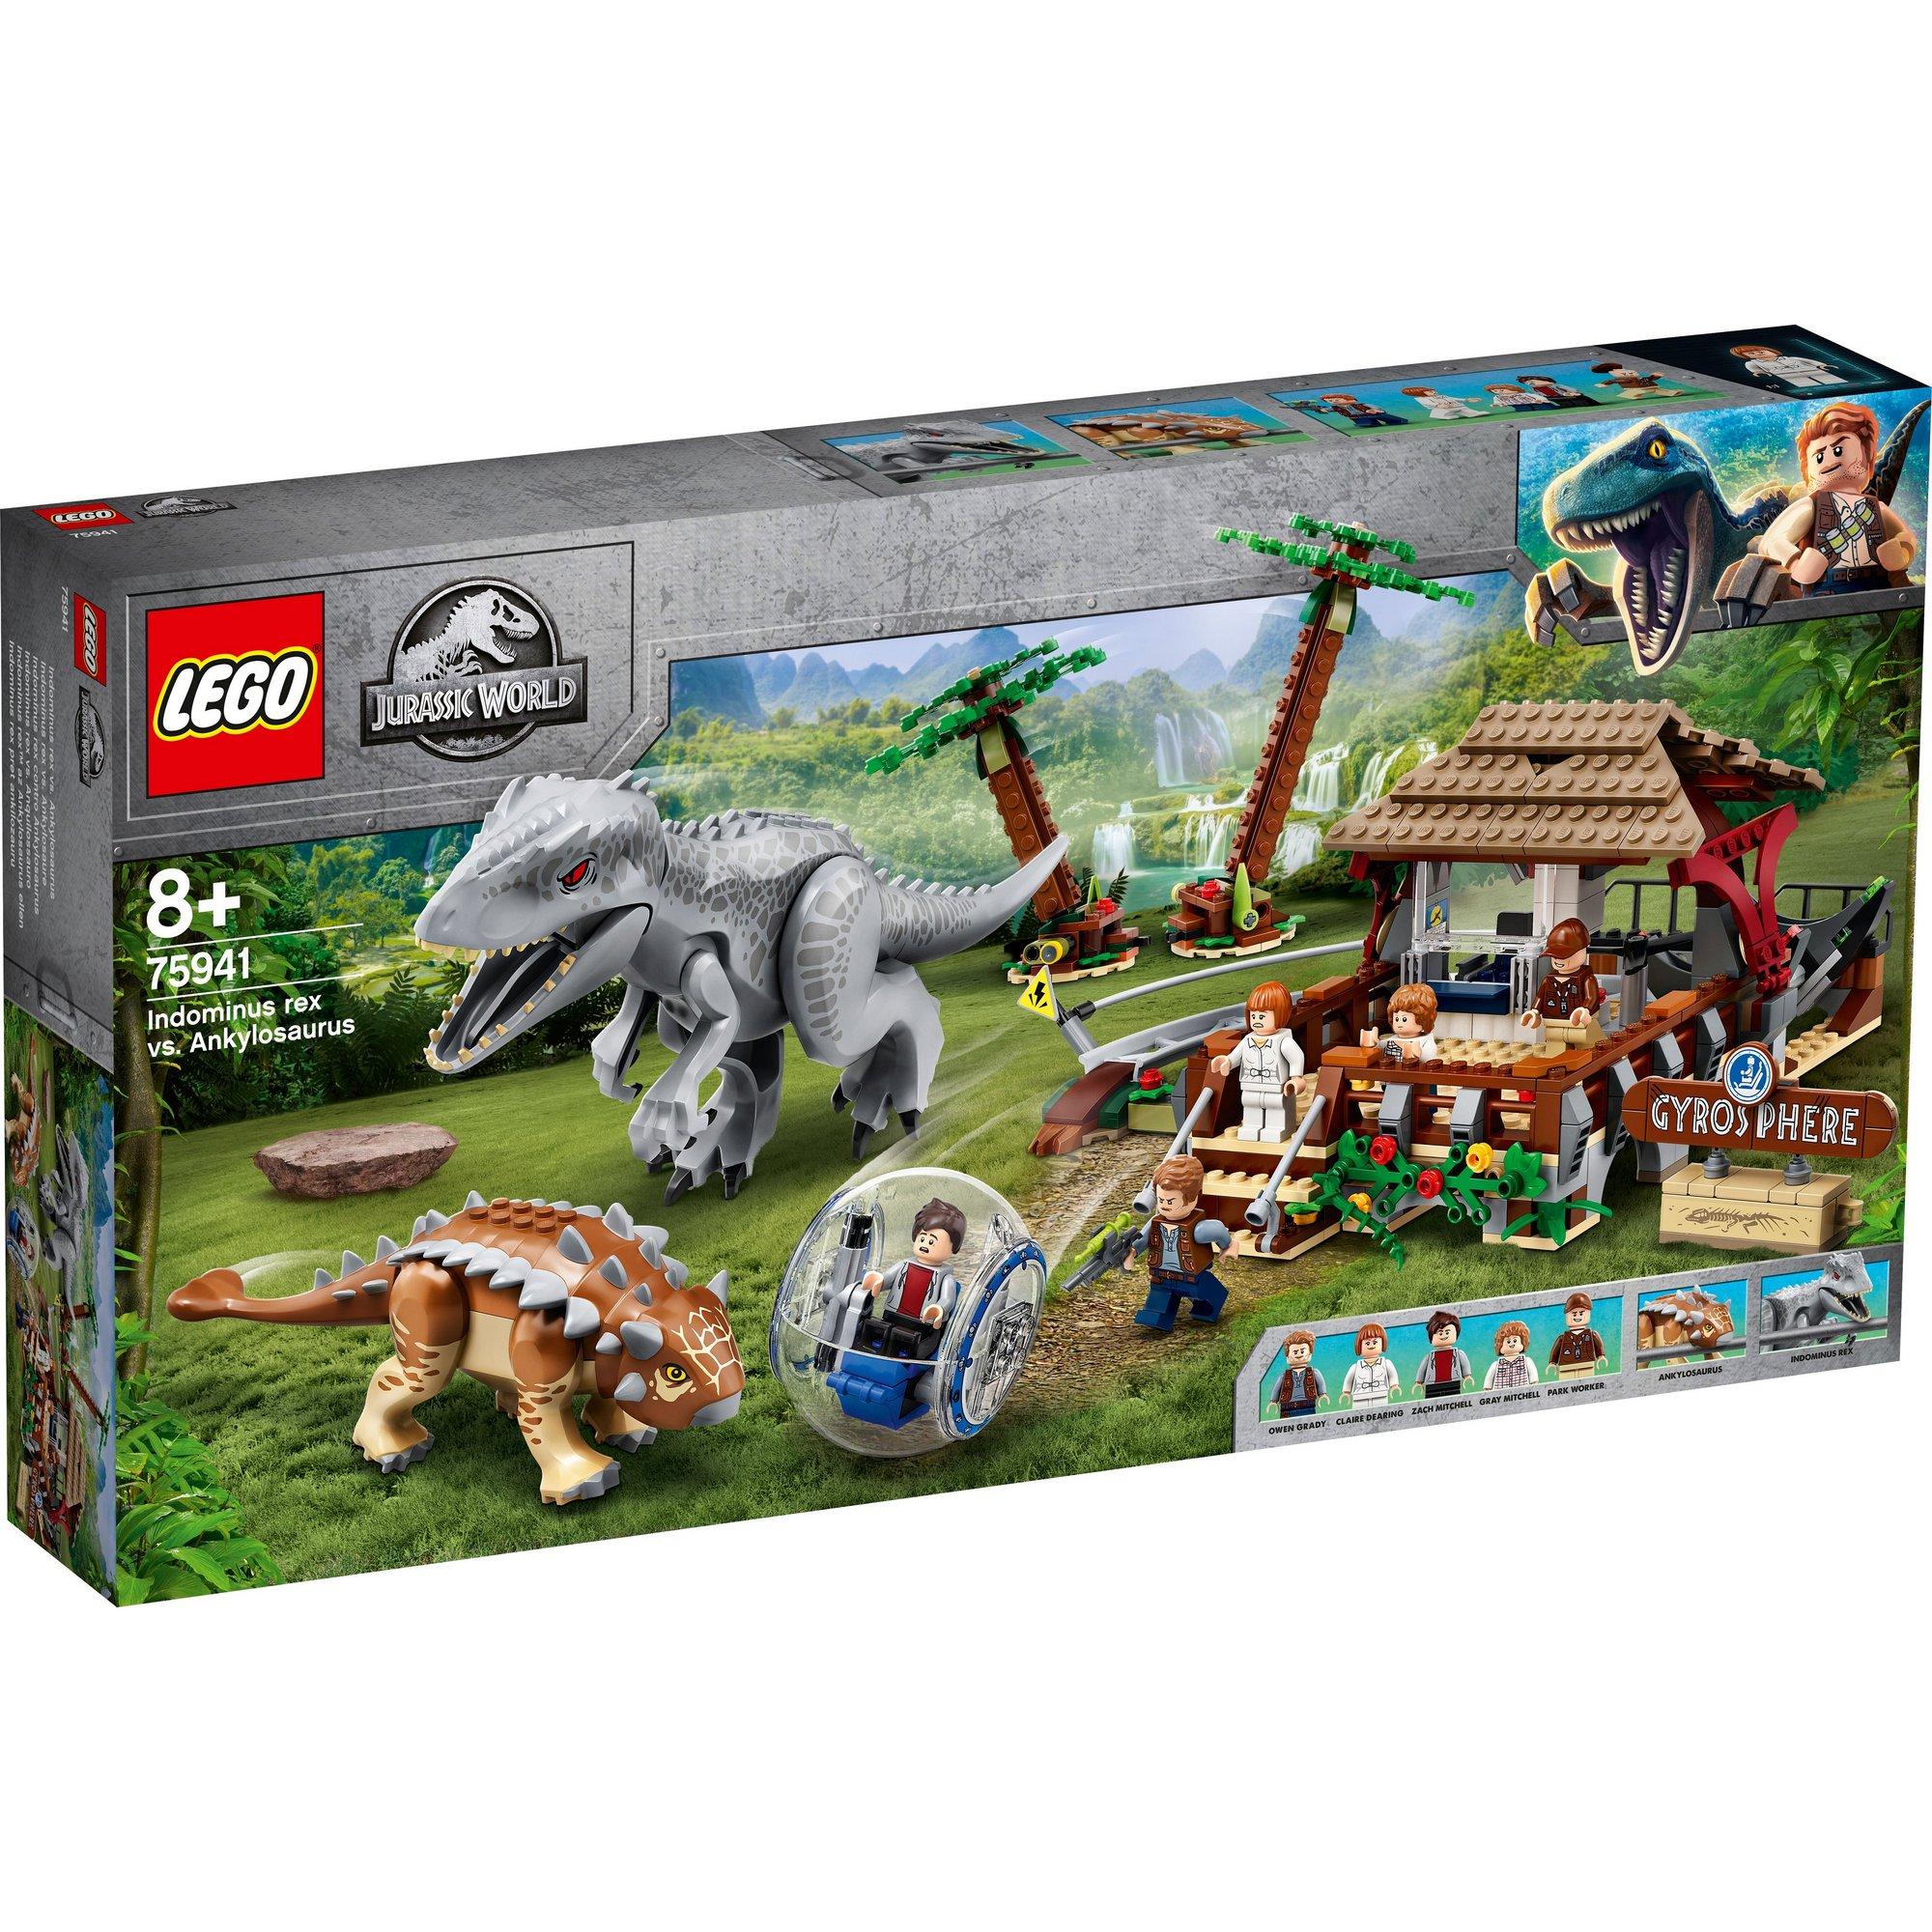 Image of LEGO Jurassic World Indominus Rex vs. Ankylosaurus